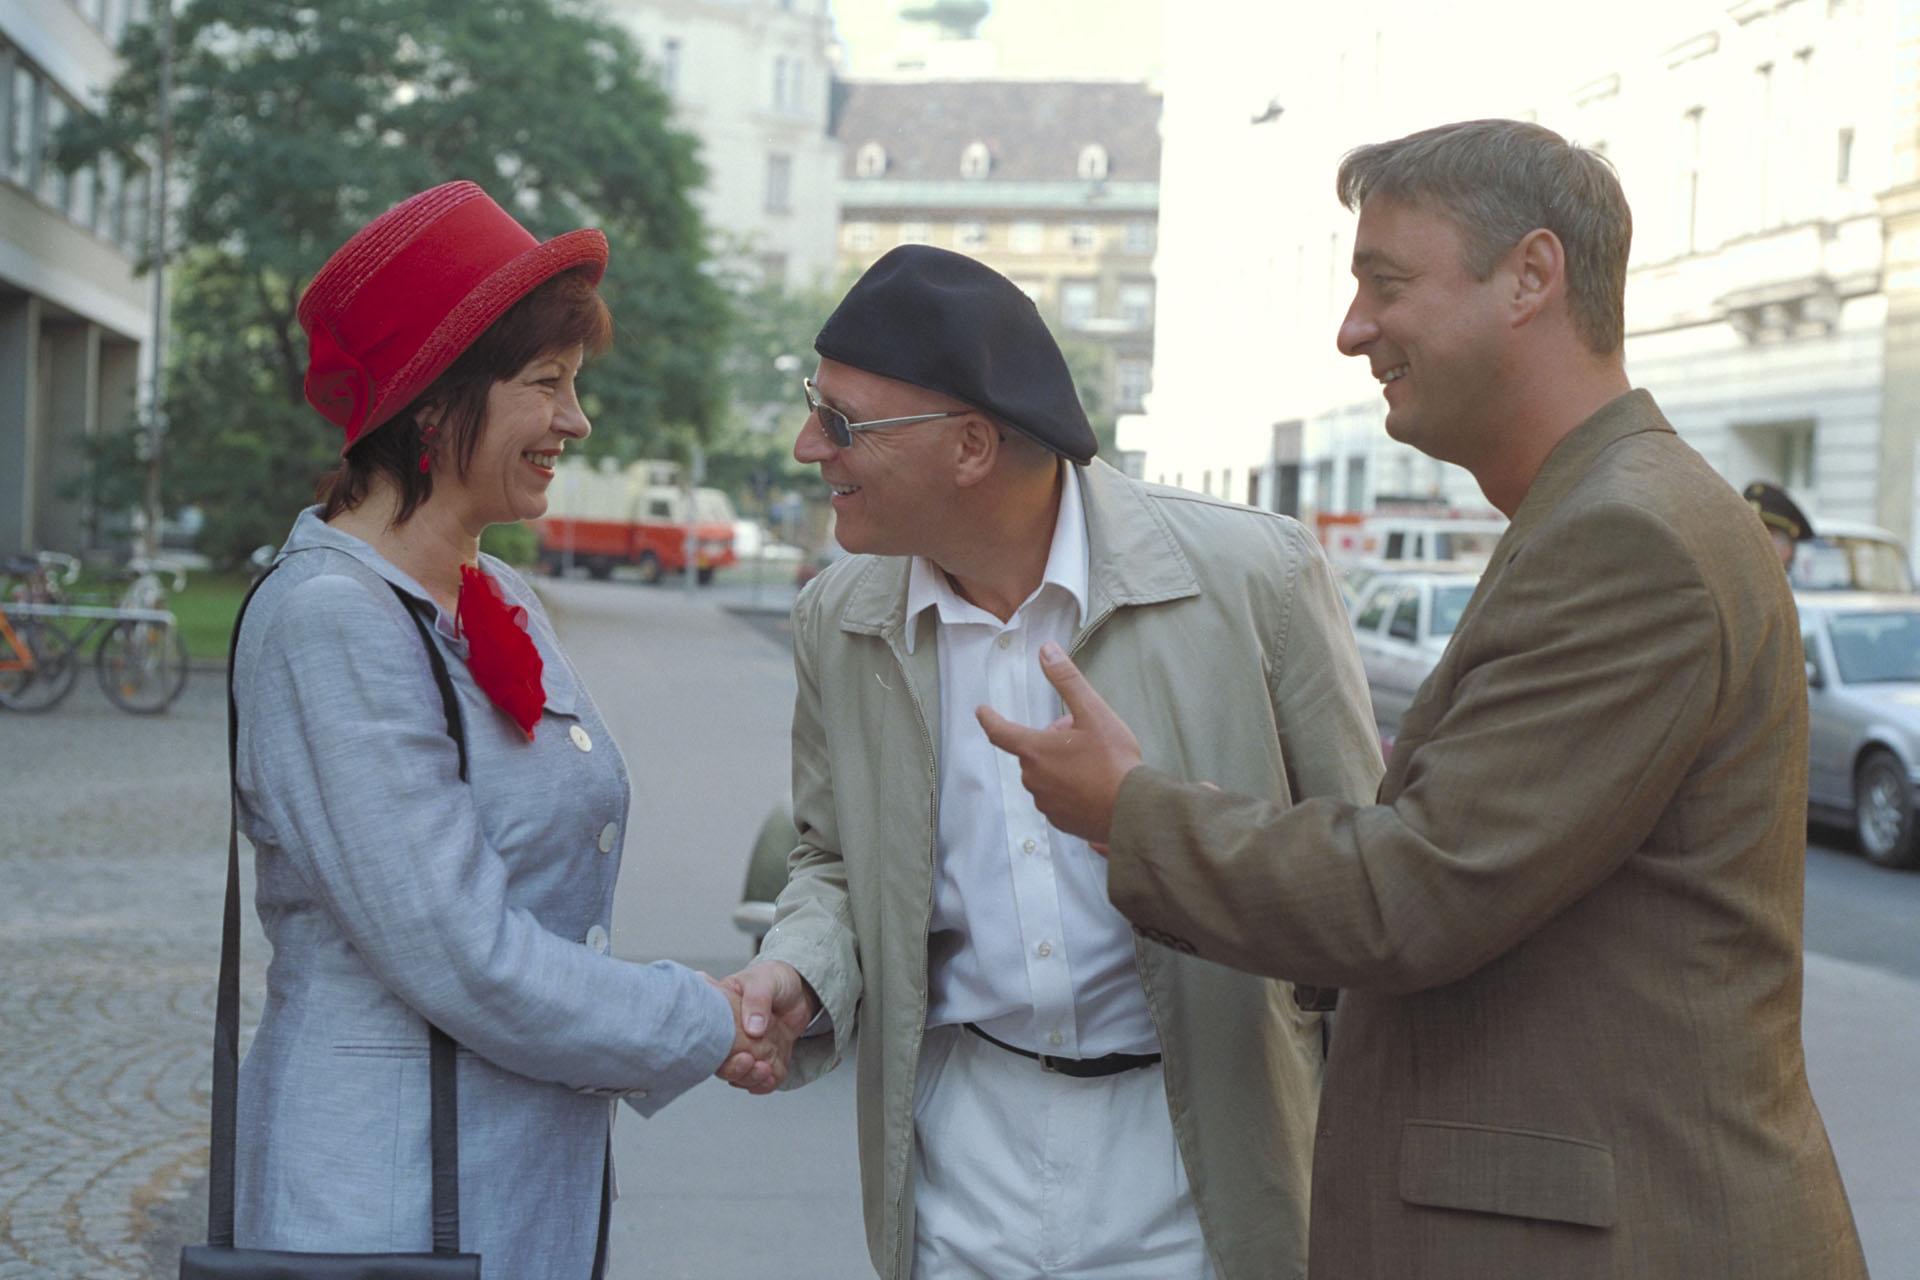 © Star*Film / Helene Waldner - Elfi Eschke, Alexander Goebel, Andreas Vitasek